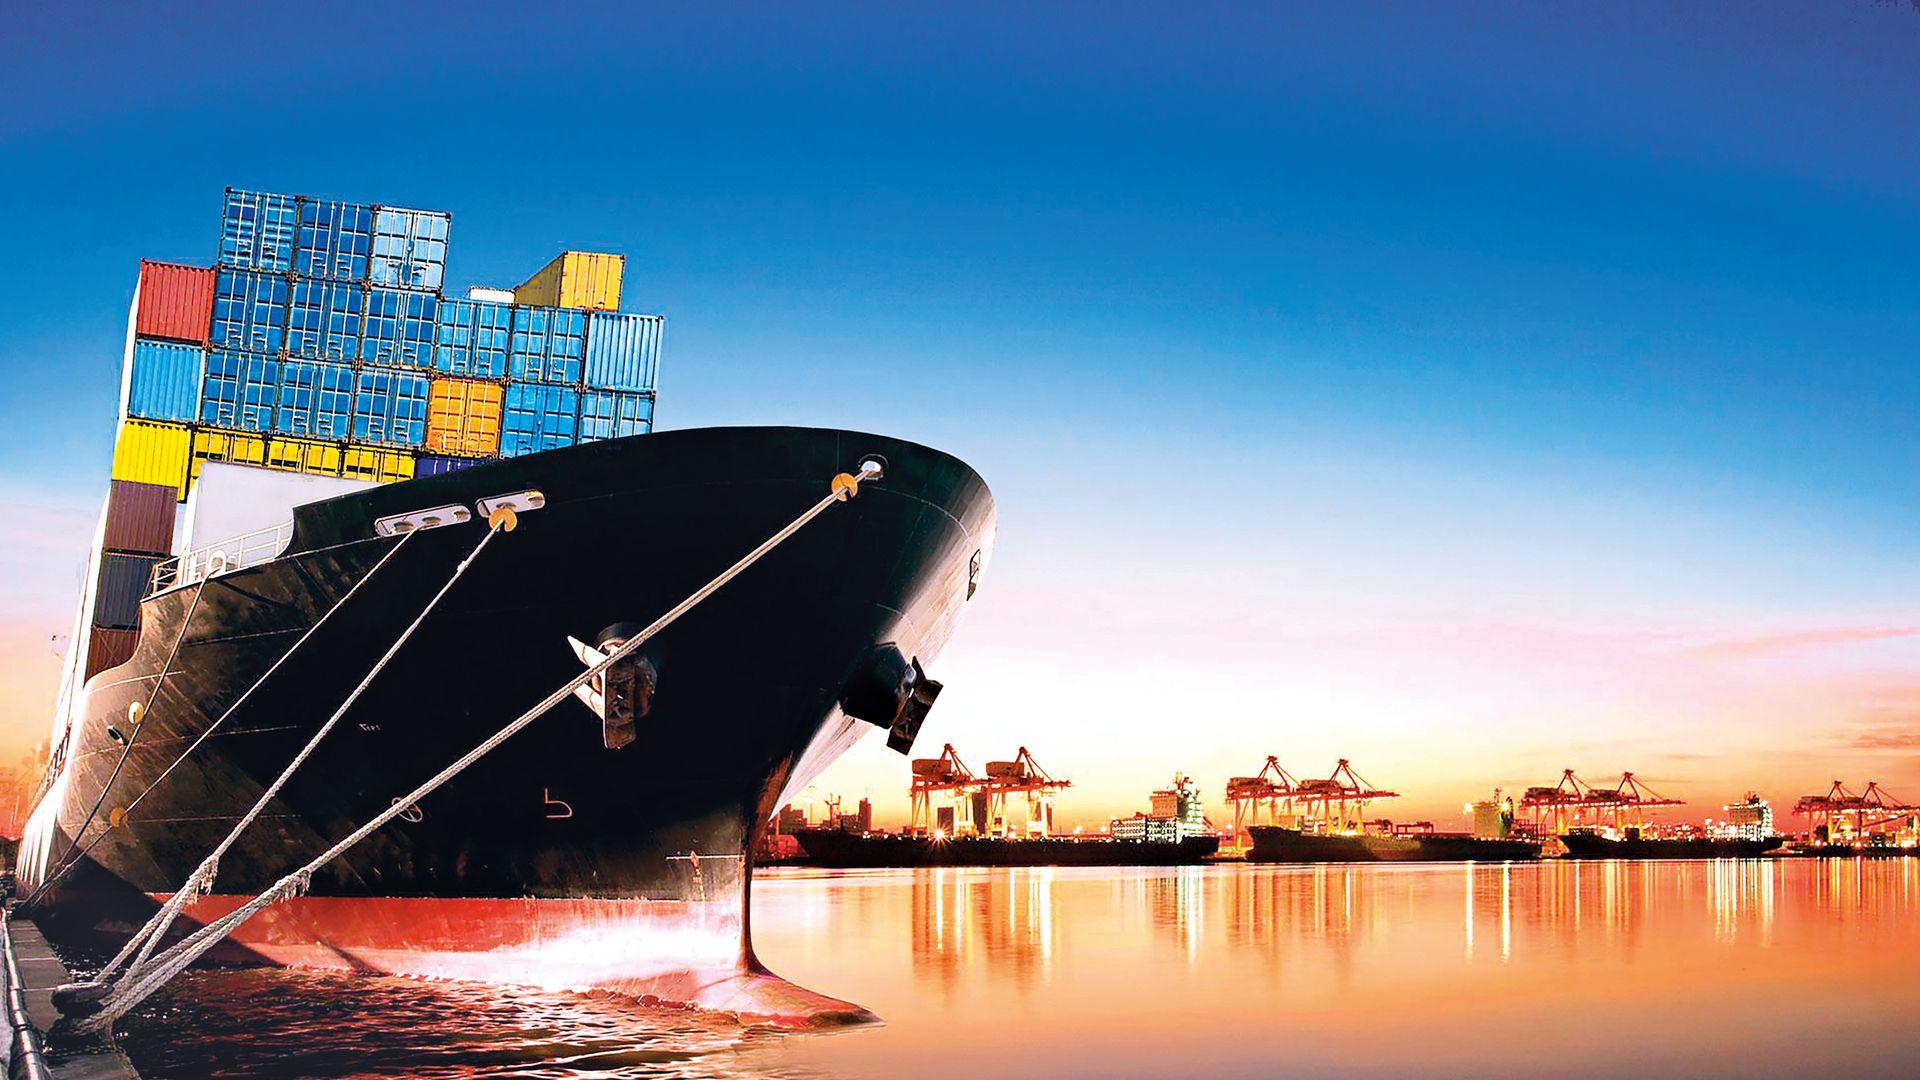 Porto Central estará preparado para receber navios de grande porte